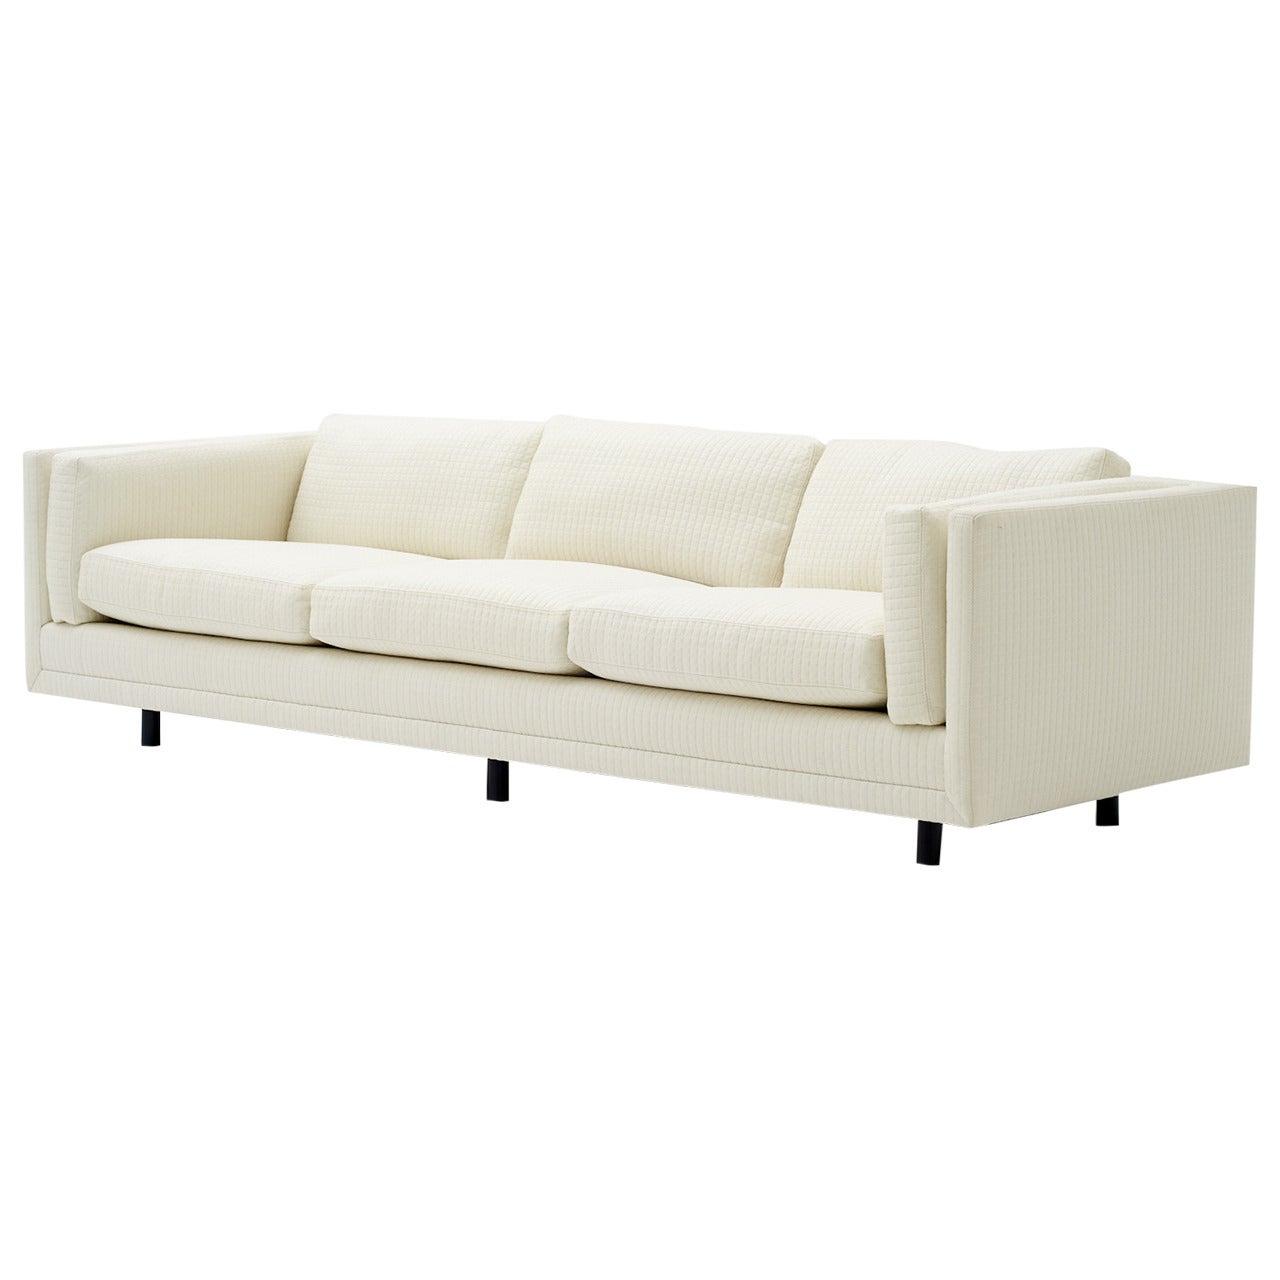 Harvey Probber Tuxedo Sofa